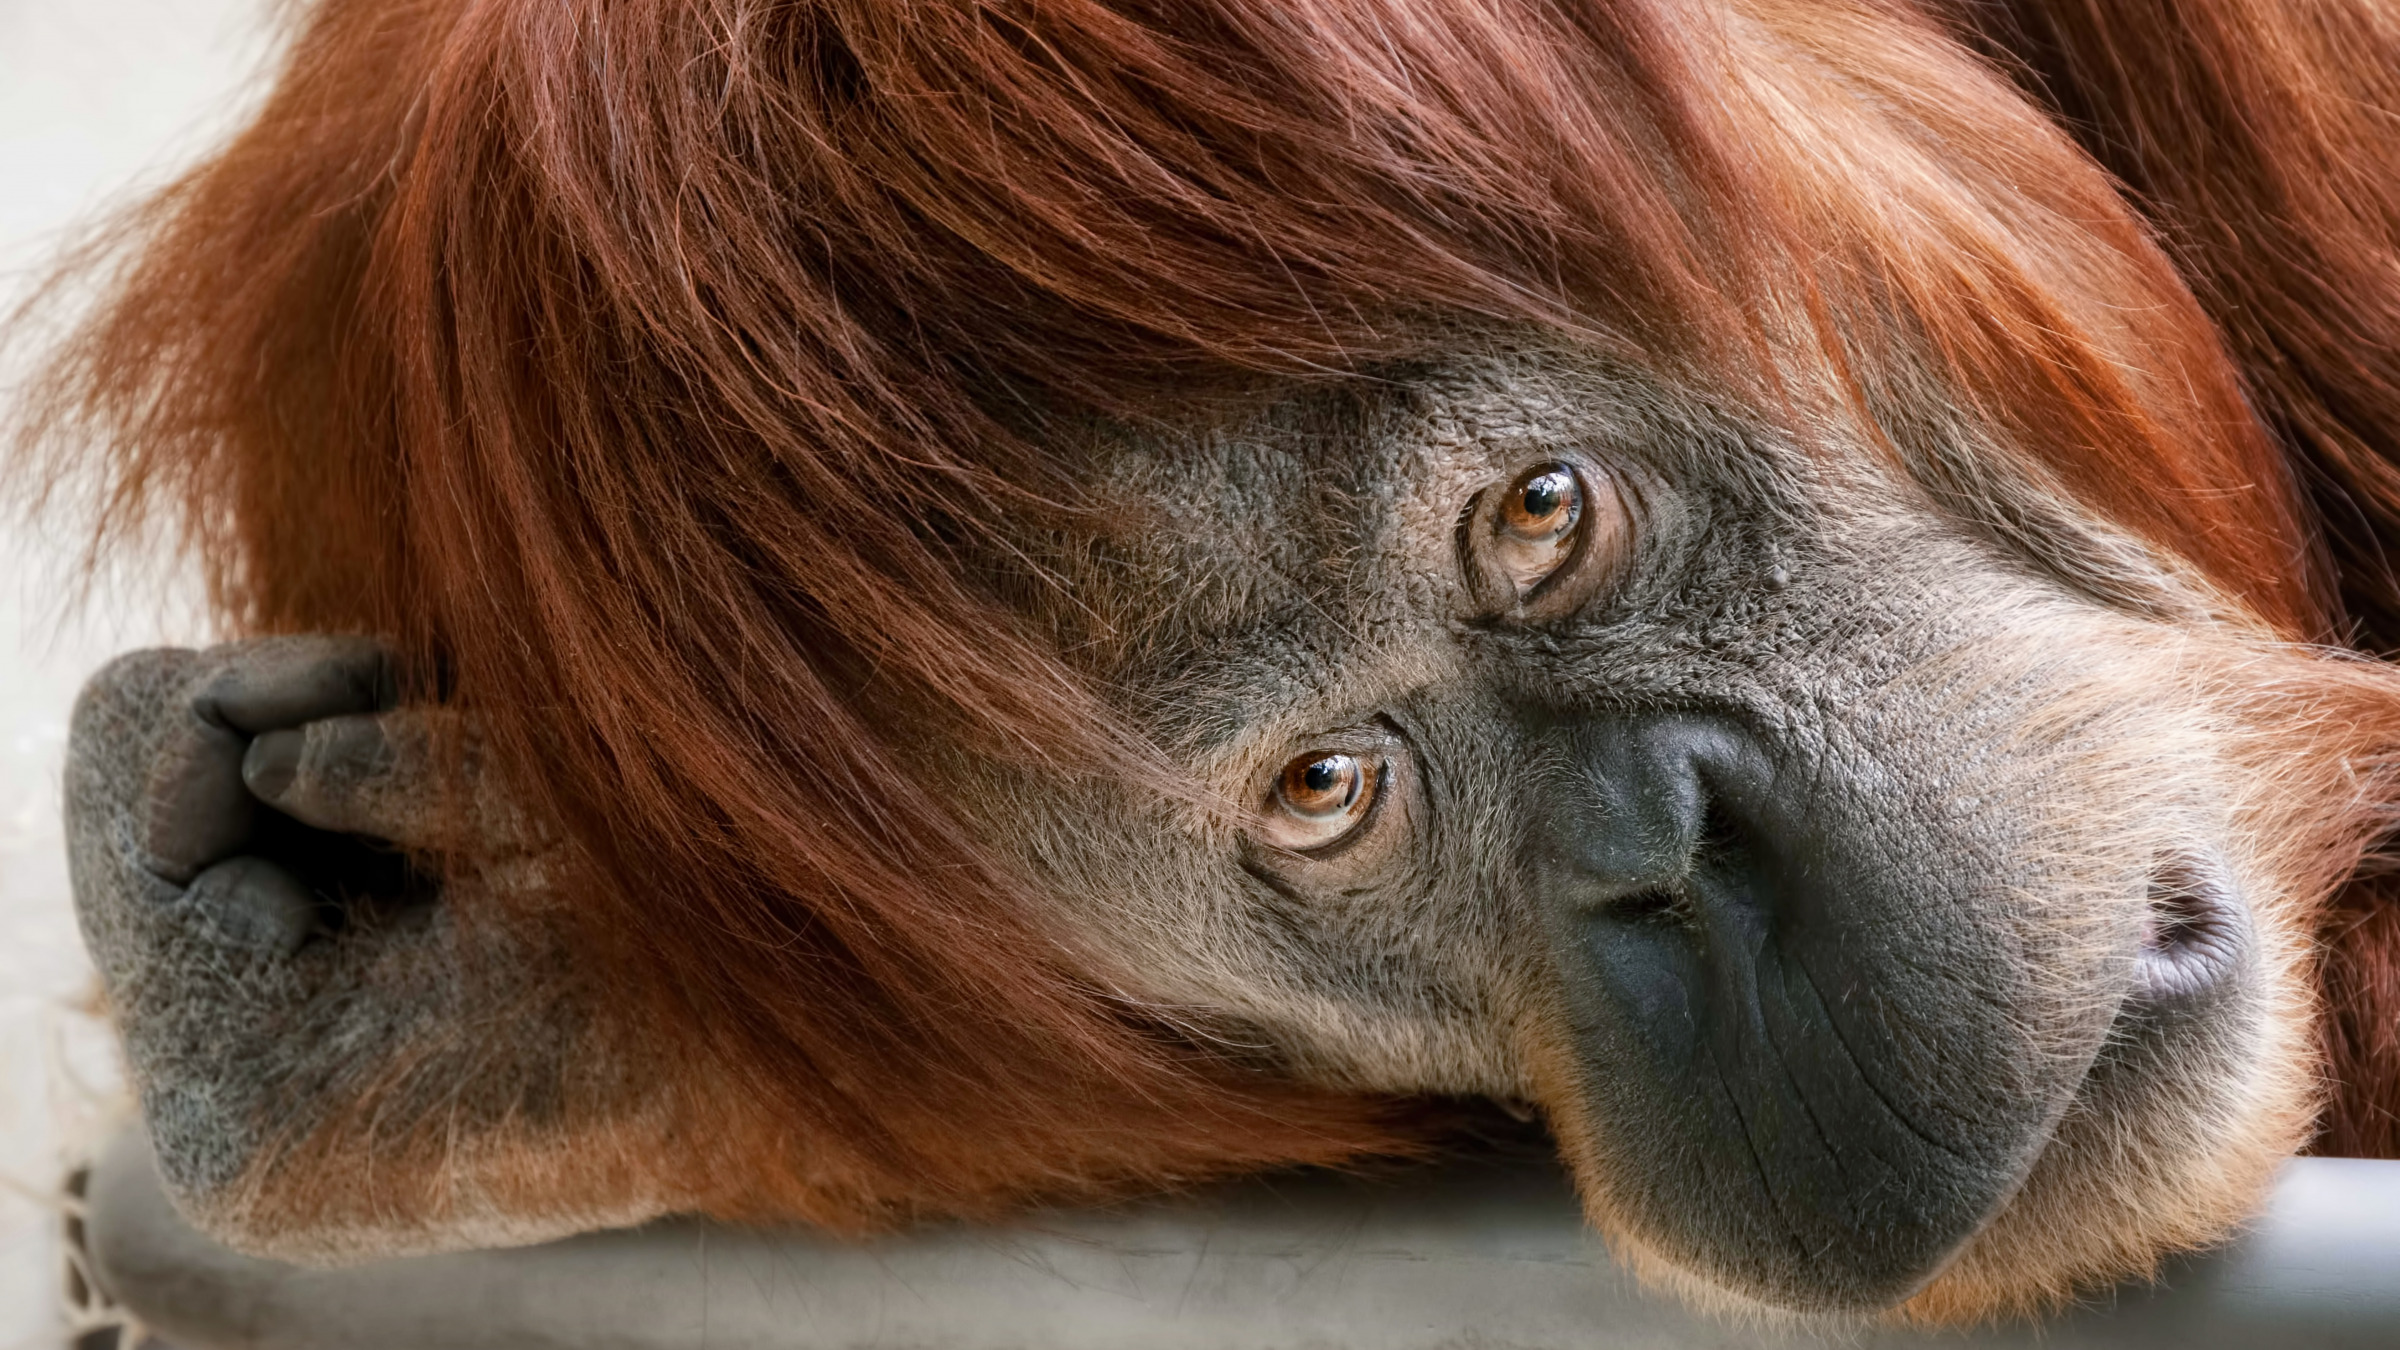 Orangutan tit free pic fucks tubes